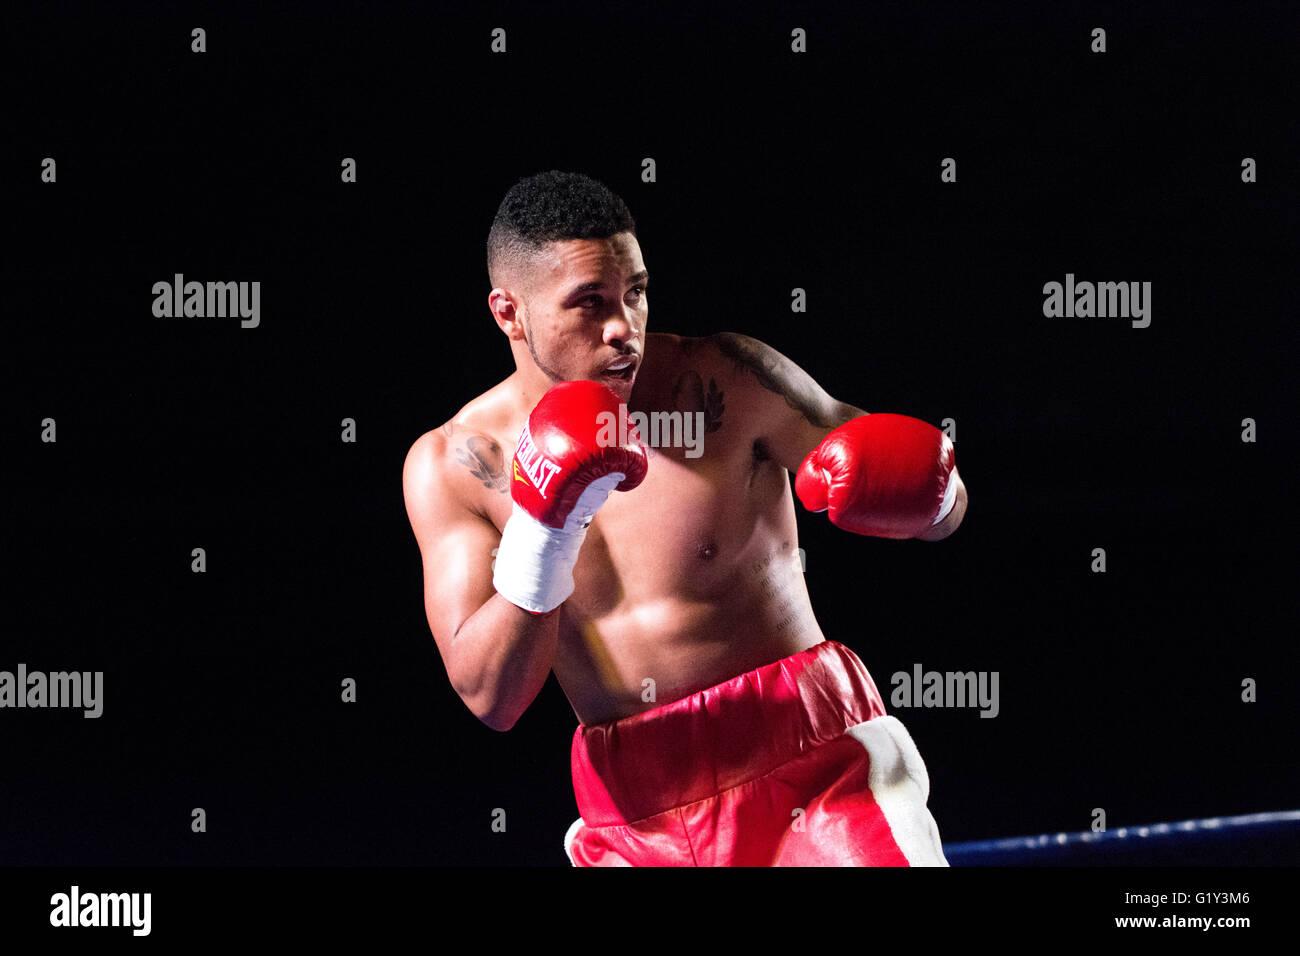 Gijon, Spain  21st May, 2016  Spanish Olympic boxer Jonathan Alonso